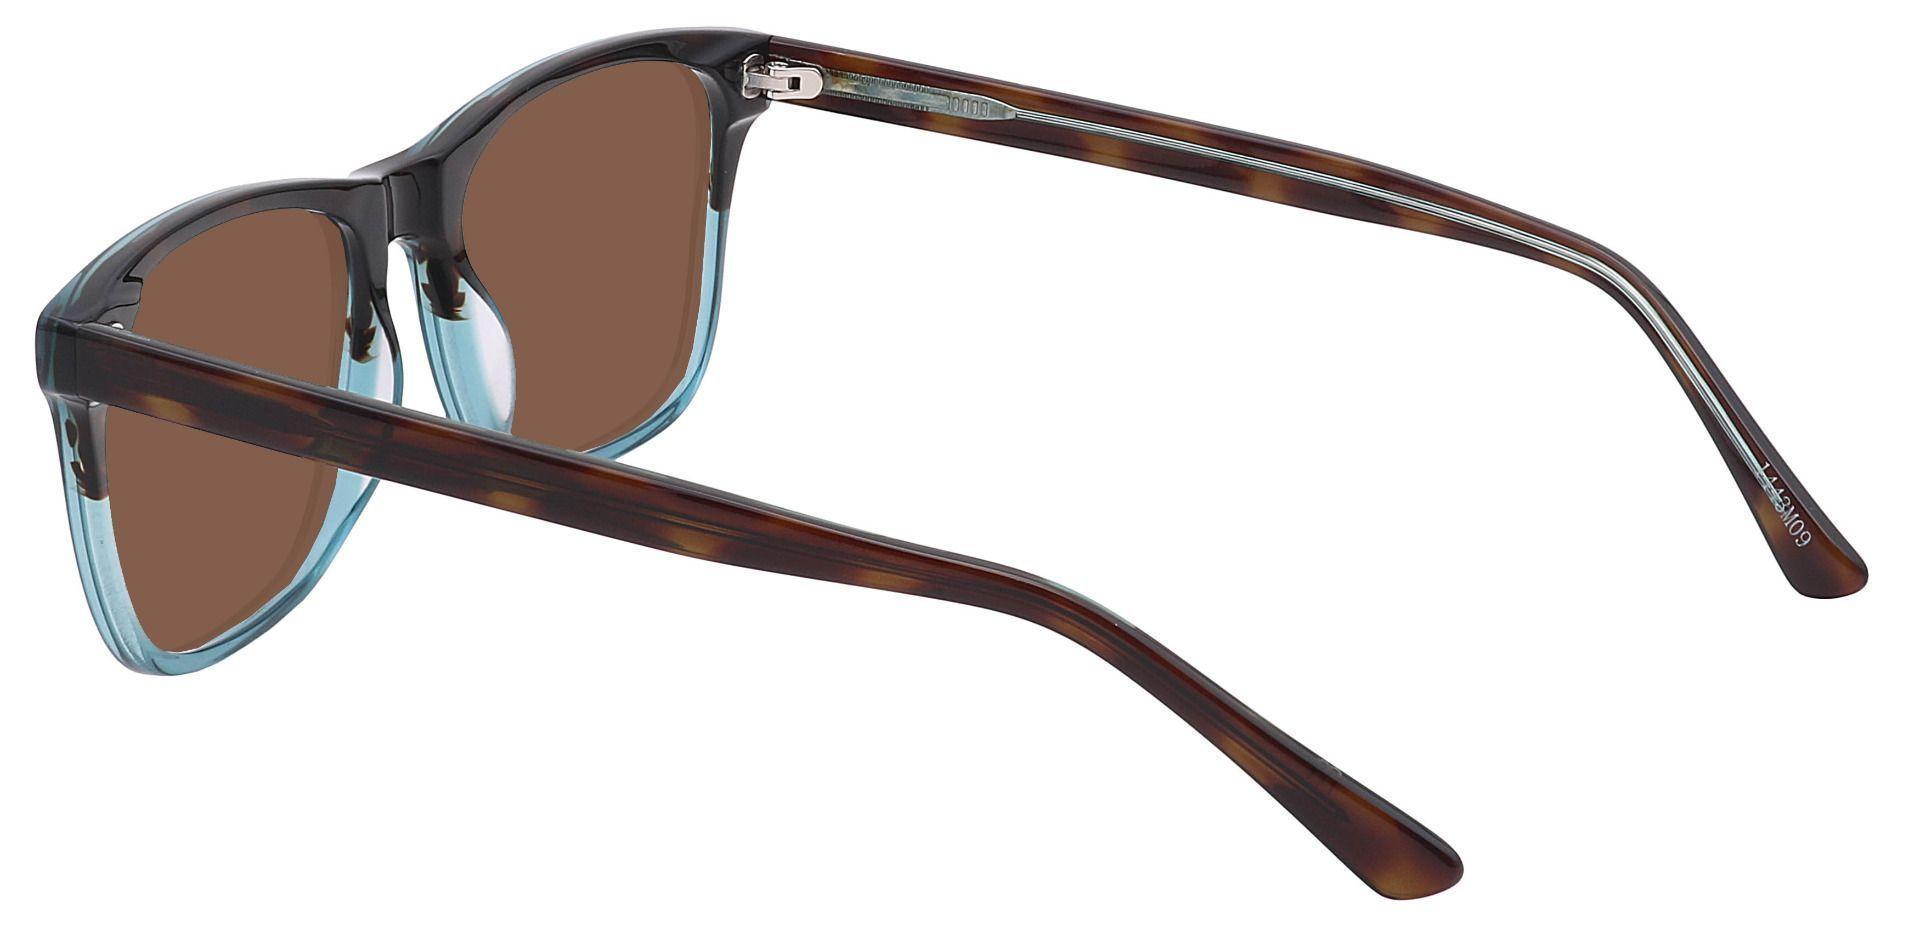 Cantina Square Prescription Sunglasses - Multi Color Frame With Brown Lenses